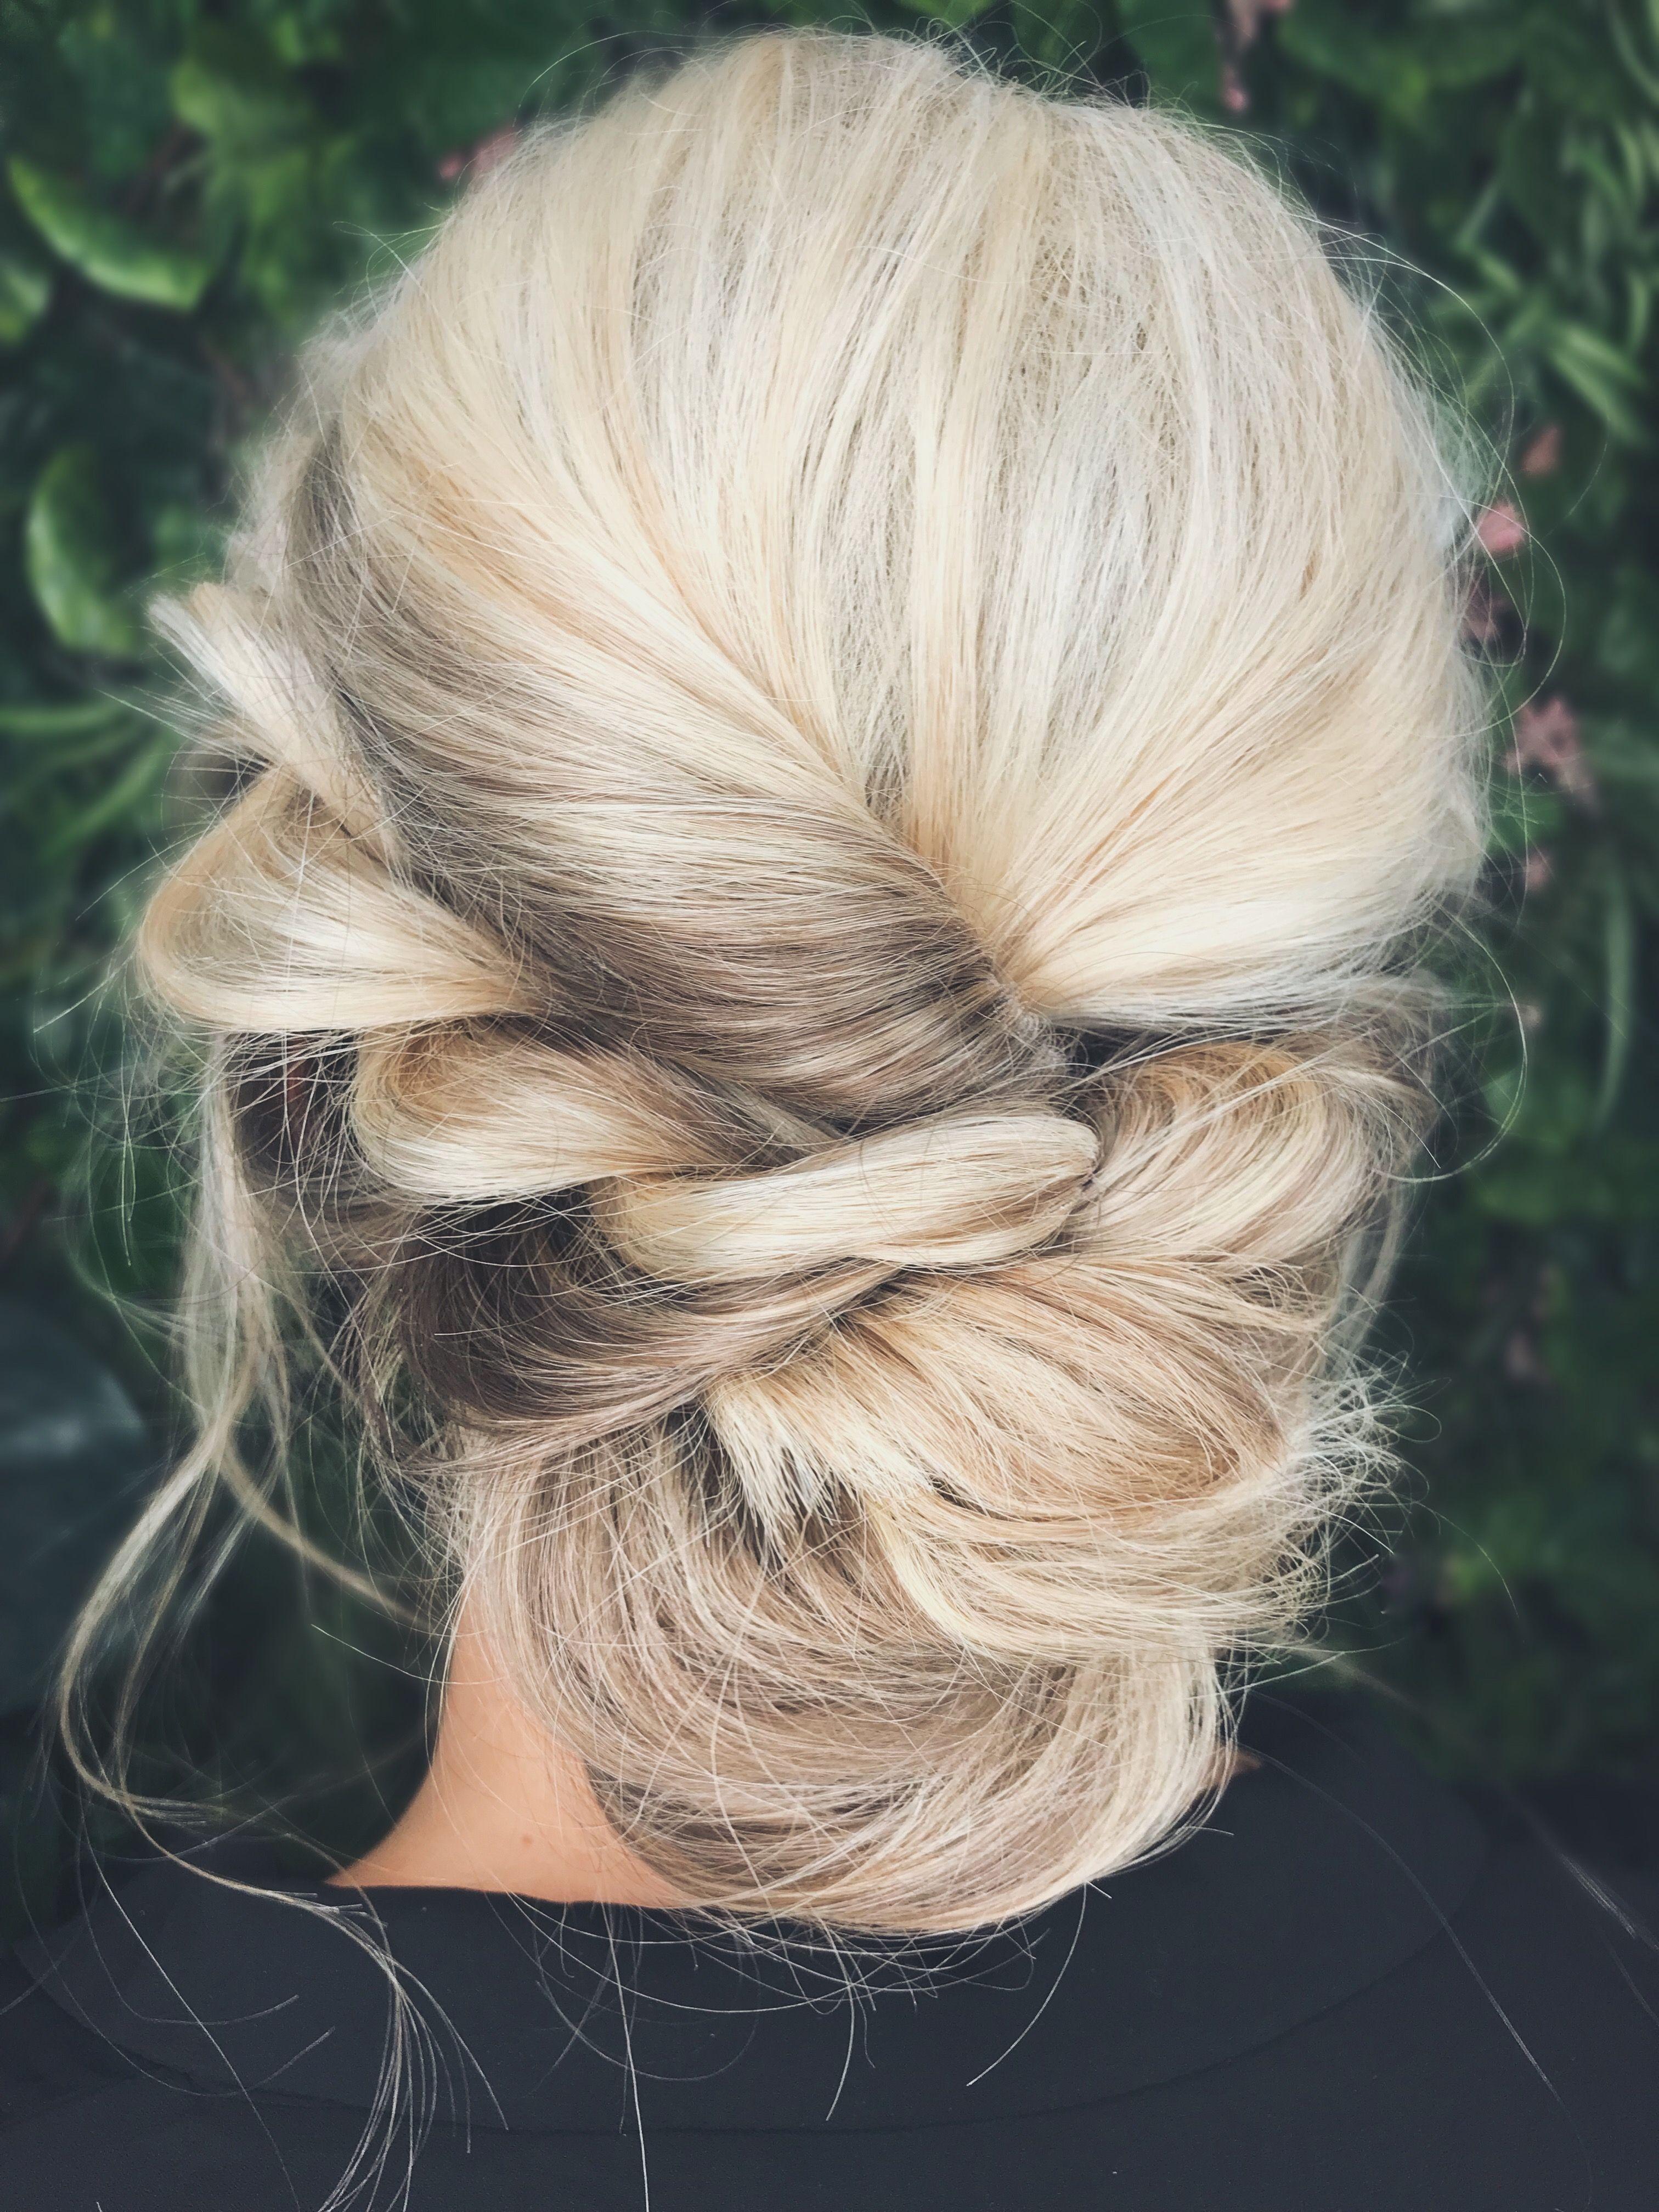 wedding hair prom hair blonde hair updo messy hair up